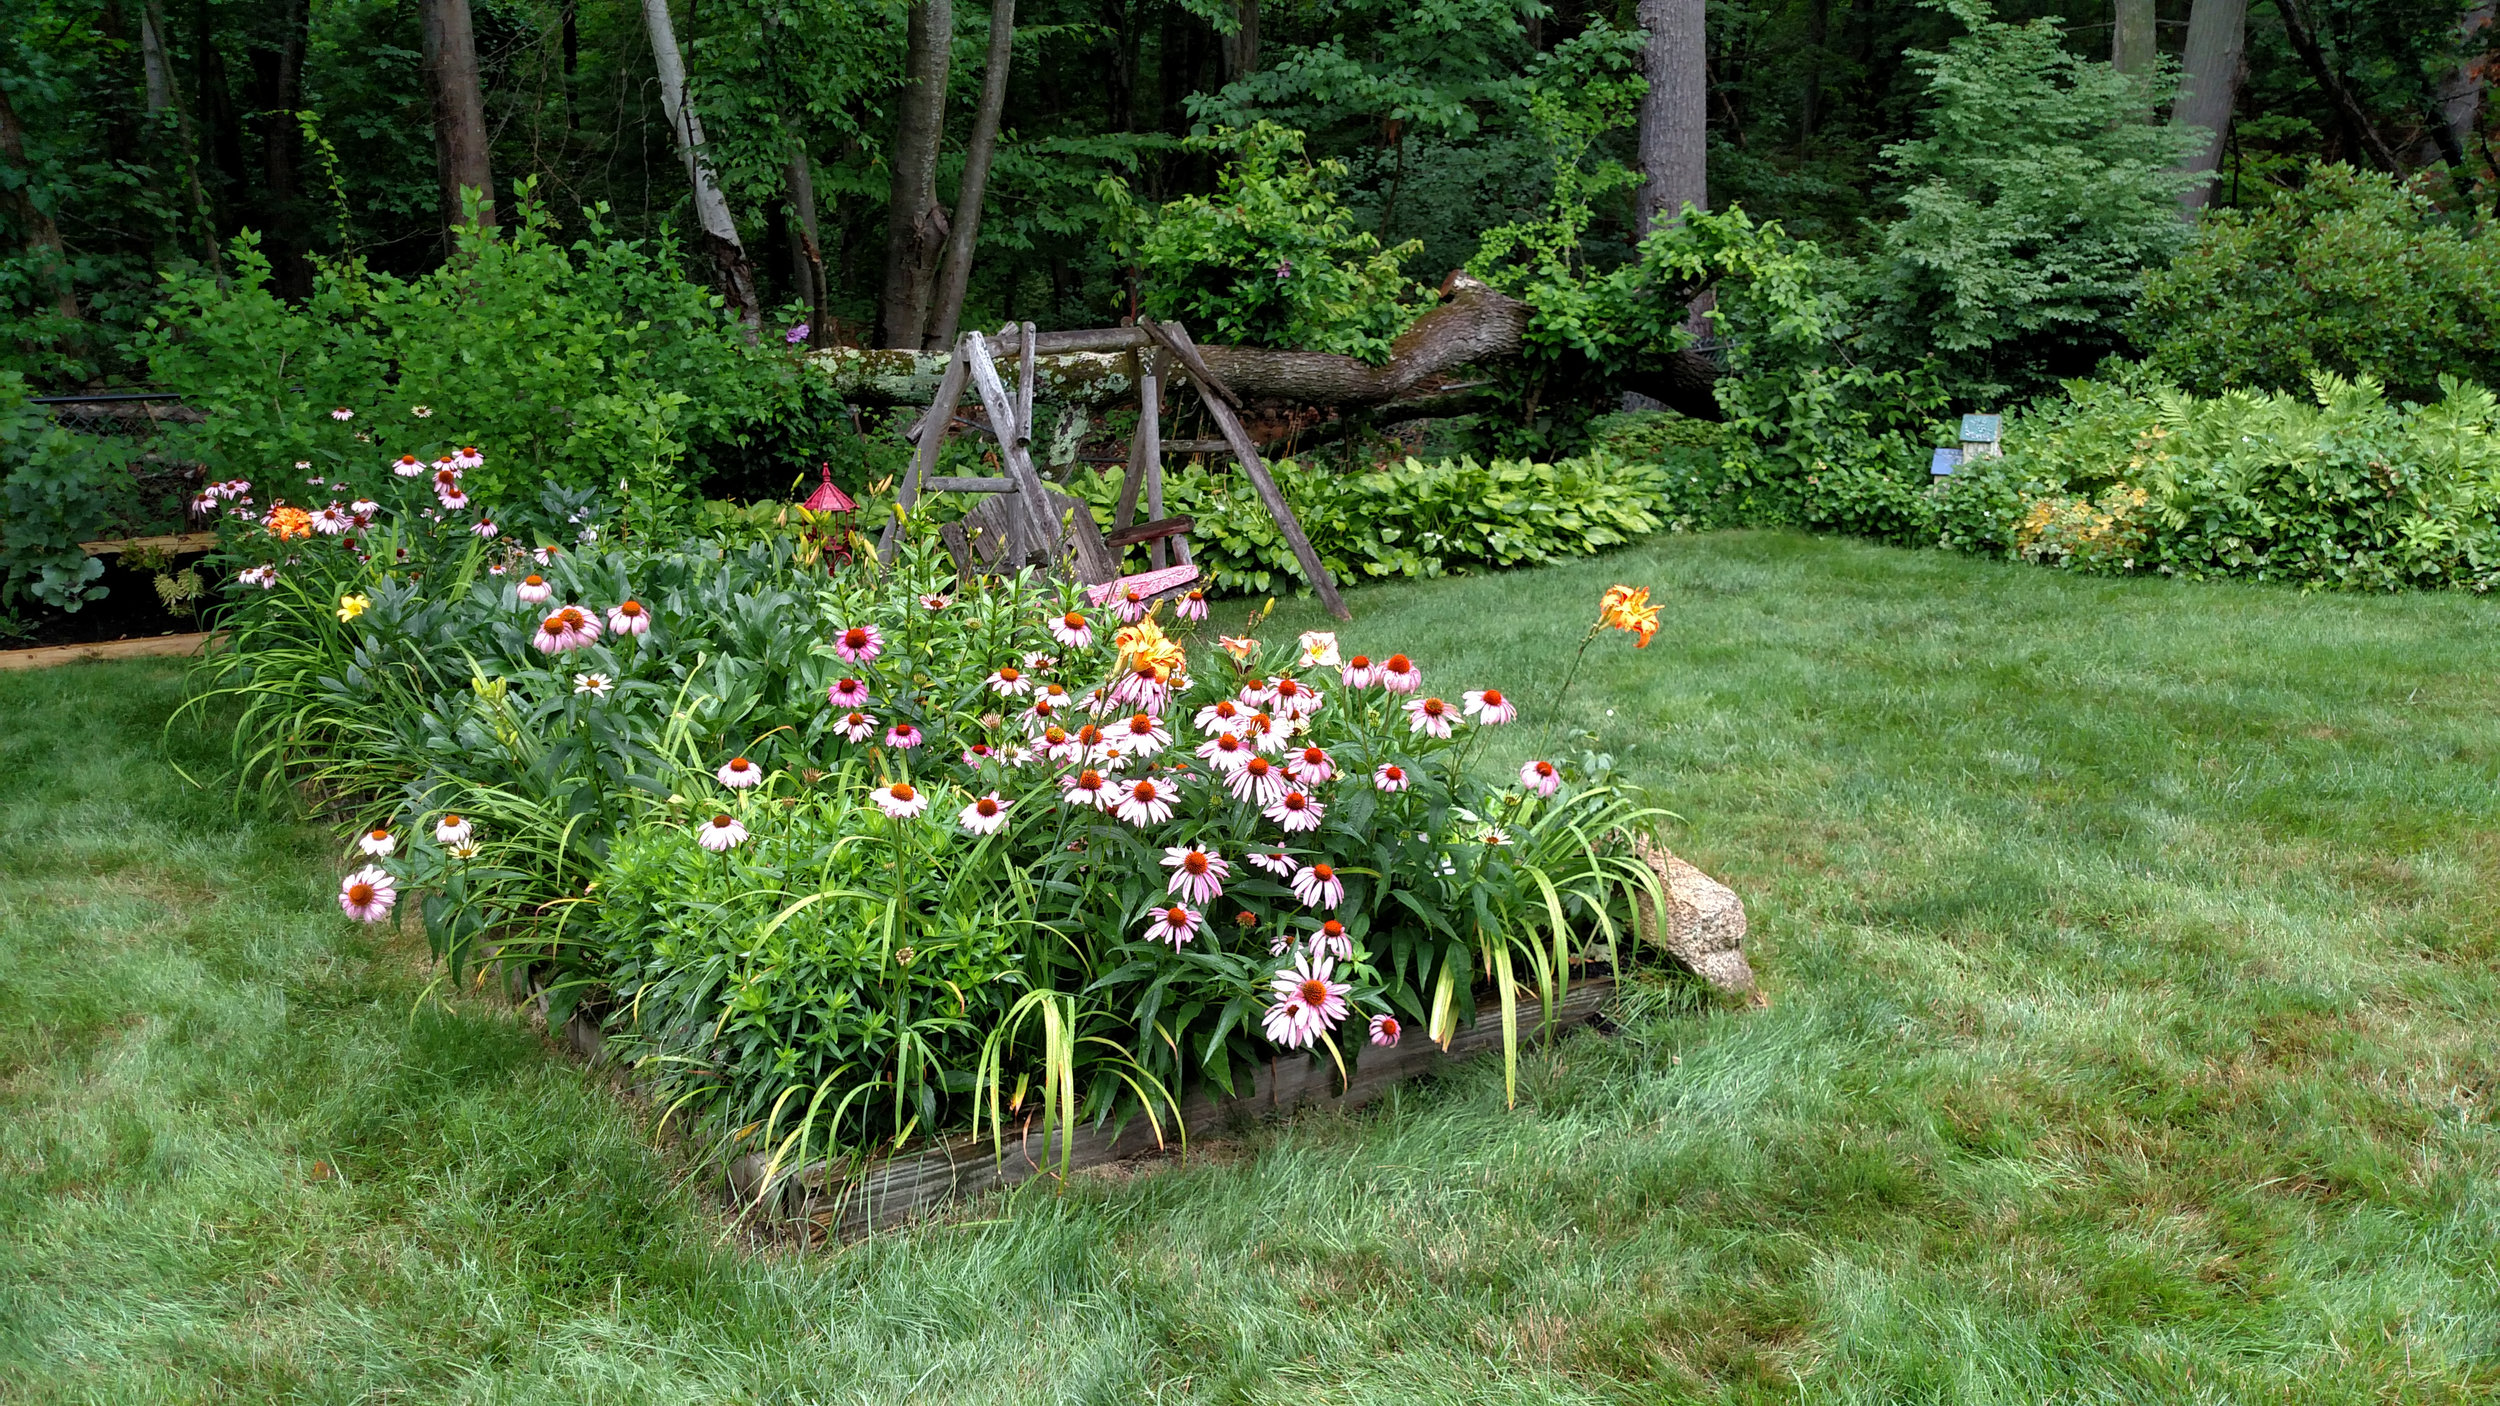 7-20-18 Shapiro Garden 8.jpg